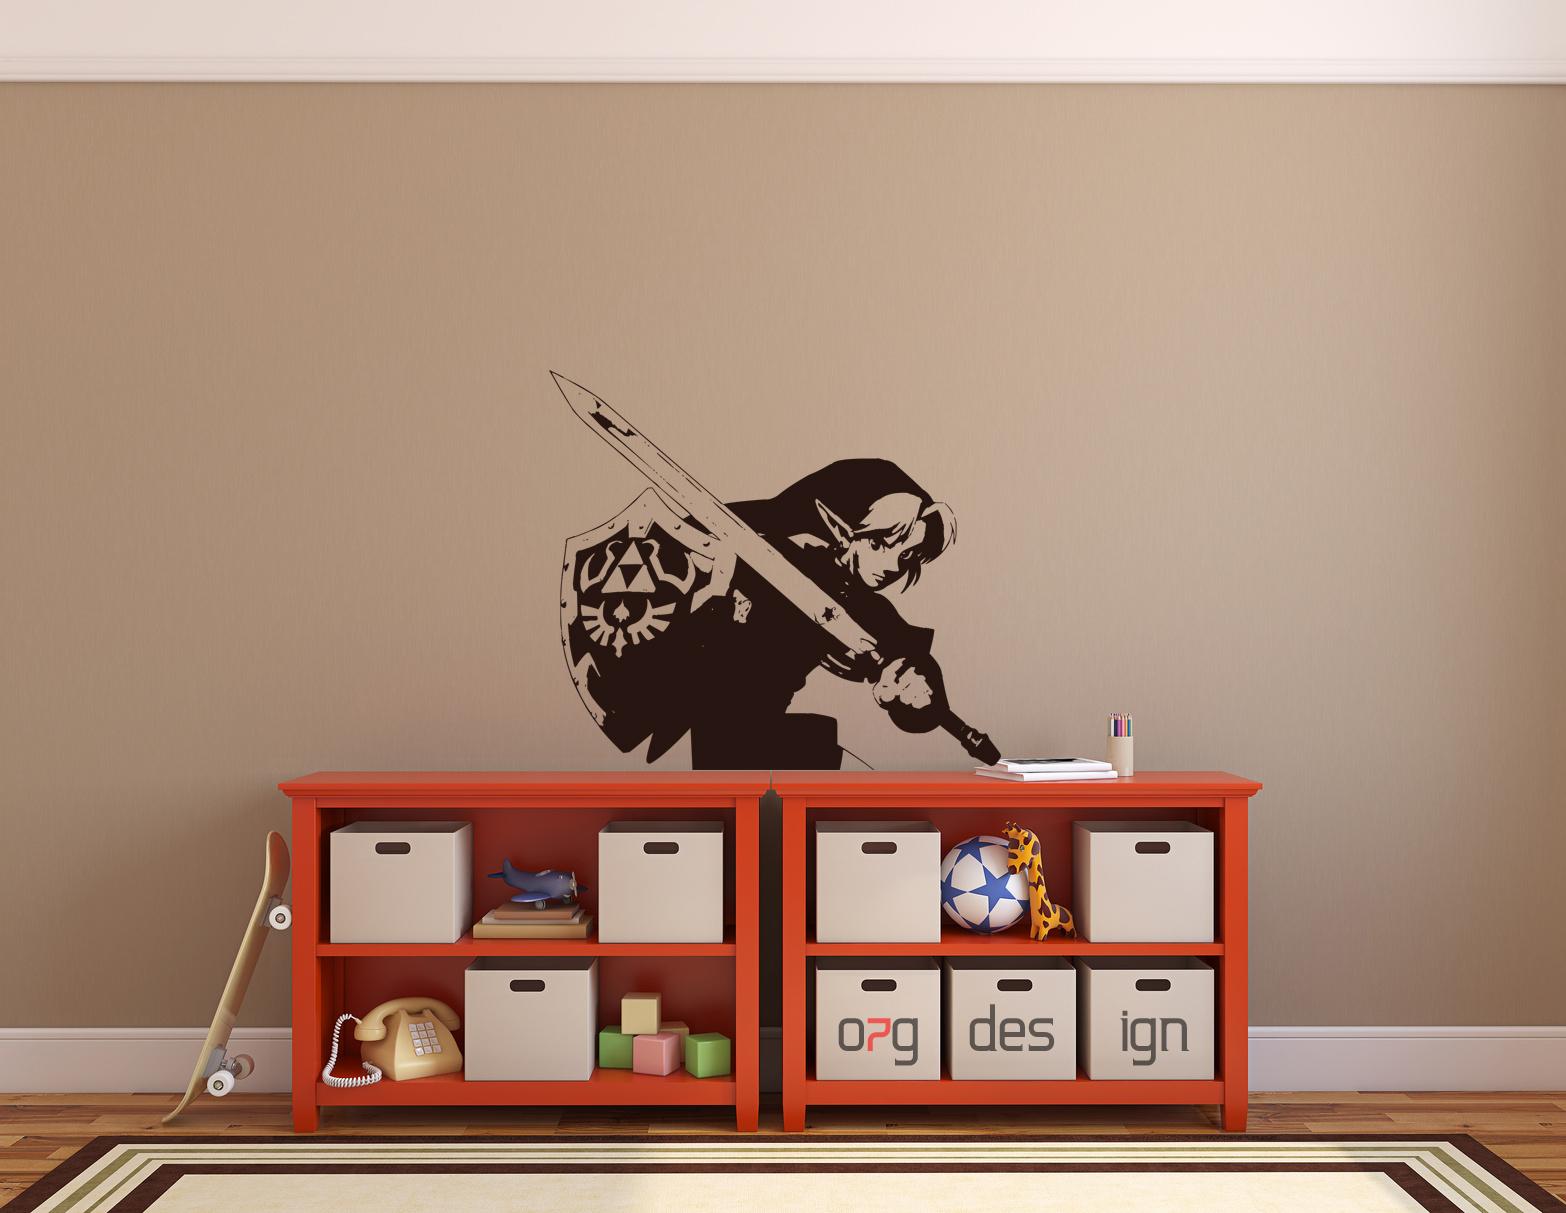 autoaufkleber sticker wandtattoo xxl spiele games zelda. Black Bedroom Furniture Sets. Home Design Ideas